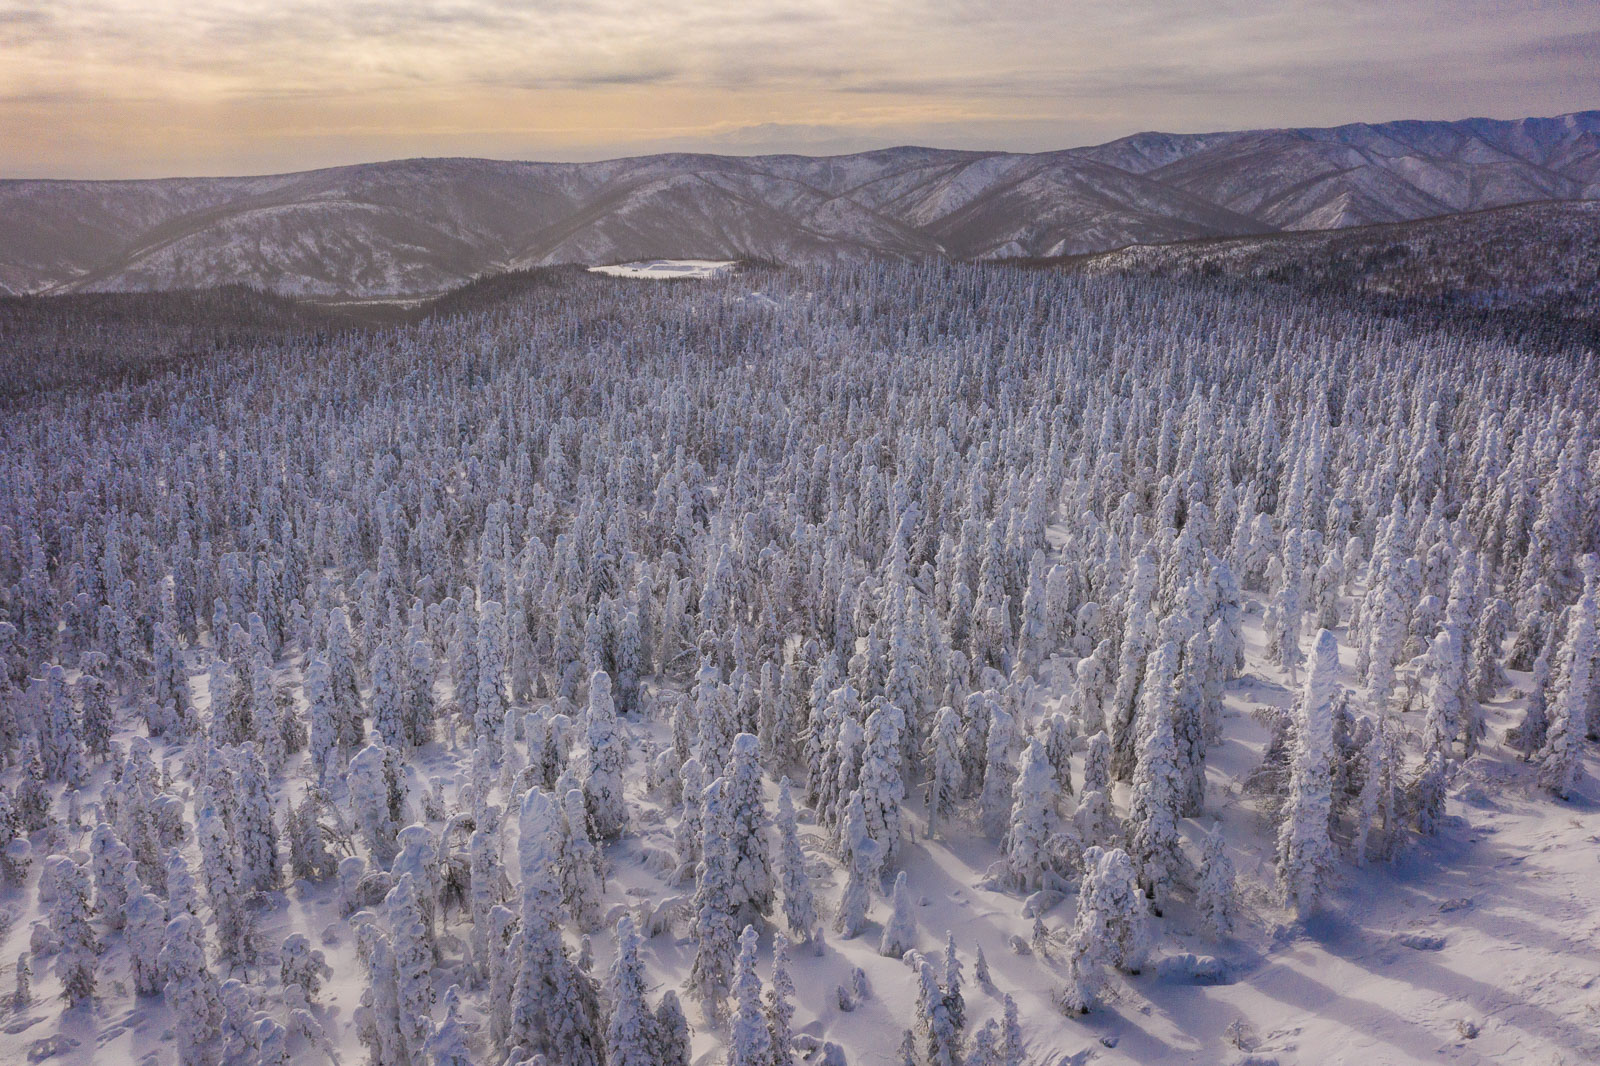 A grove of snowy trees fills the landscape along the Dalton Highway near the Yukon River, Alaska.